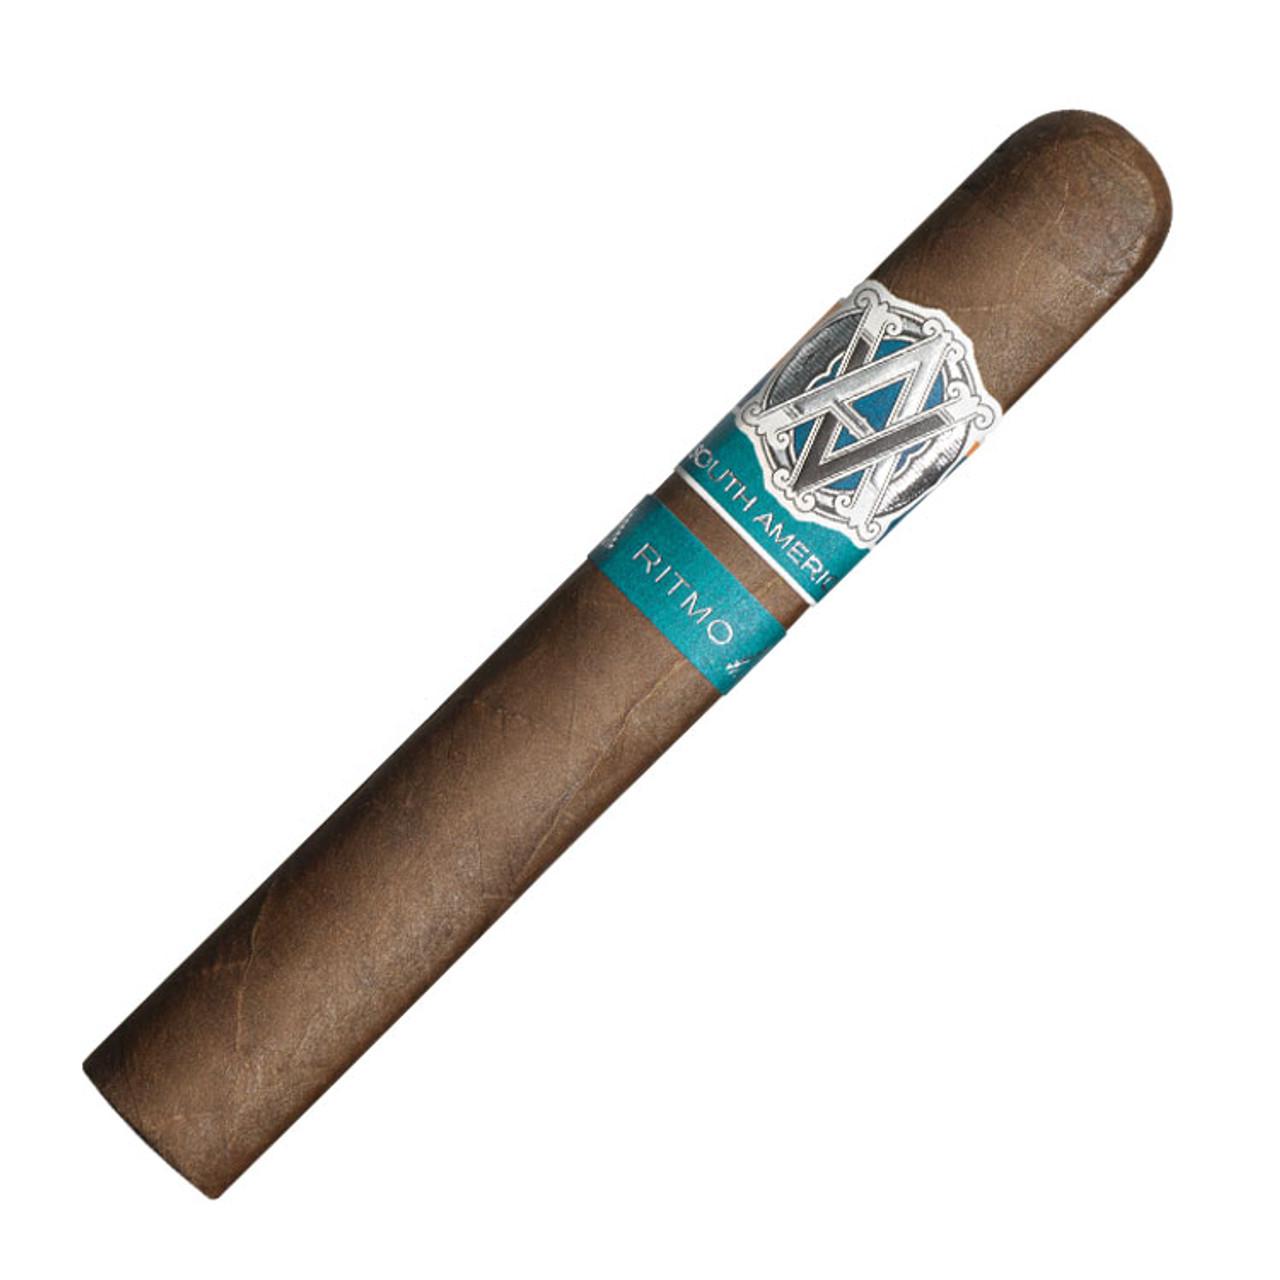 AVO Syncro Ritmo Super Toro Cigar